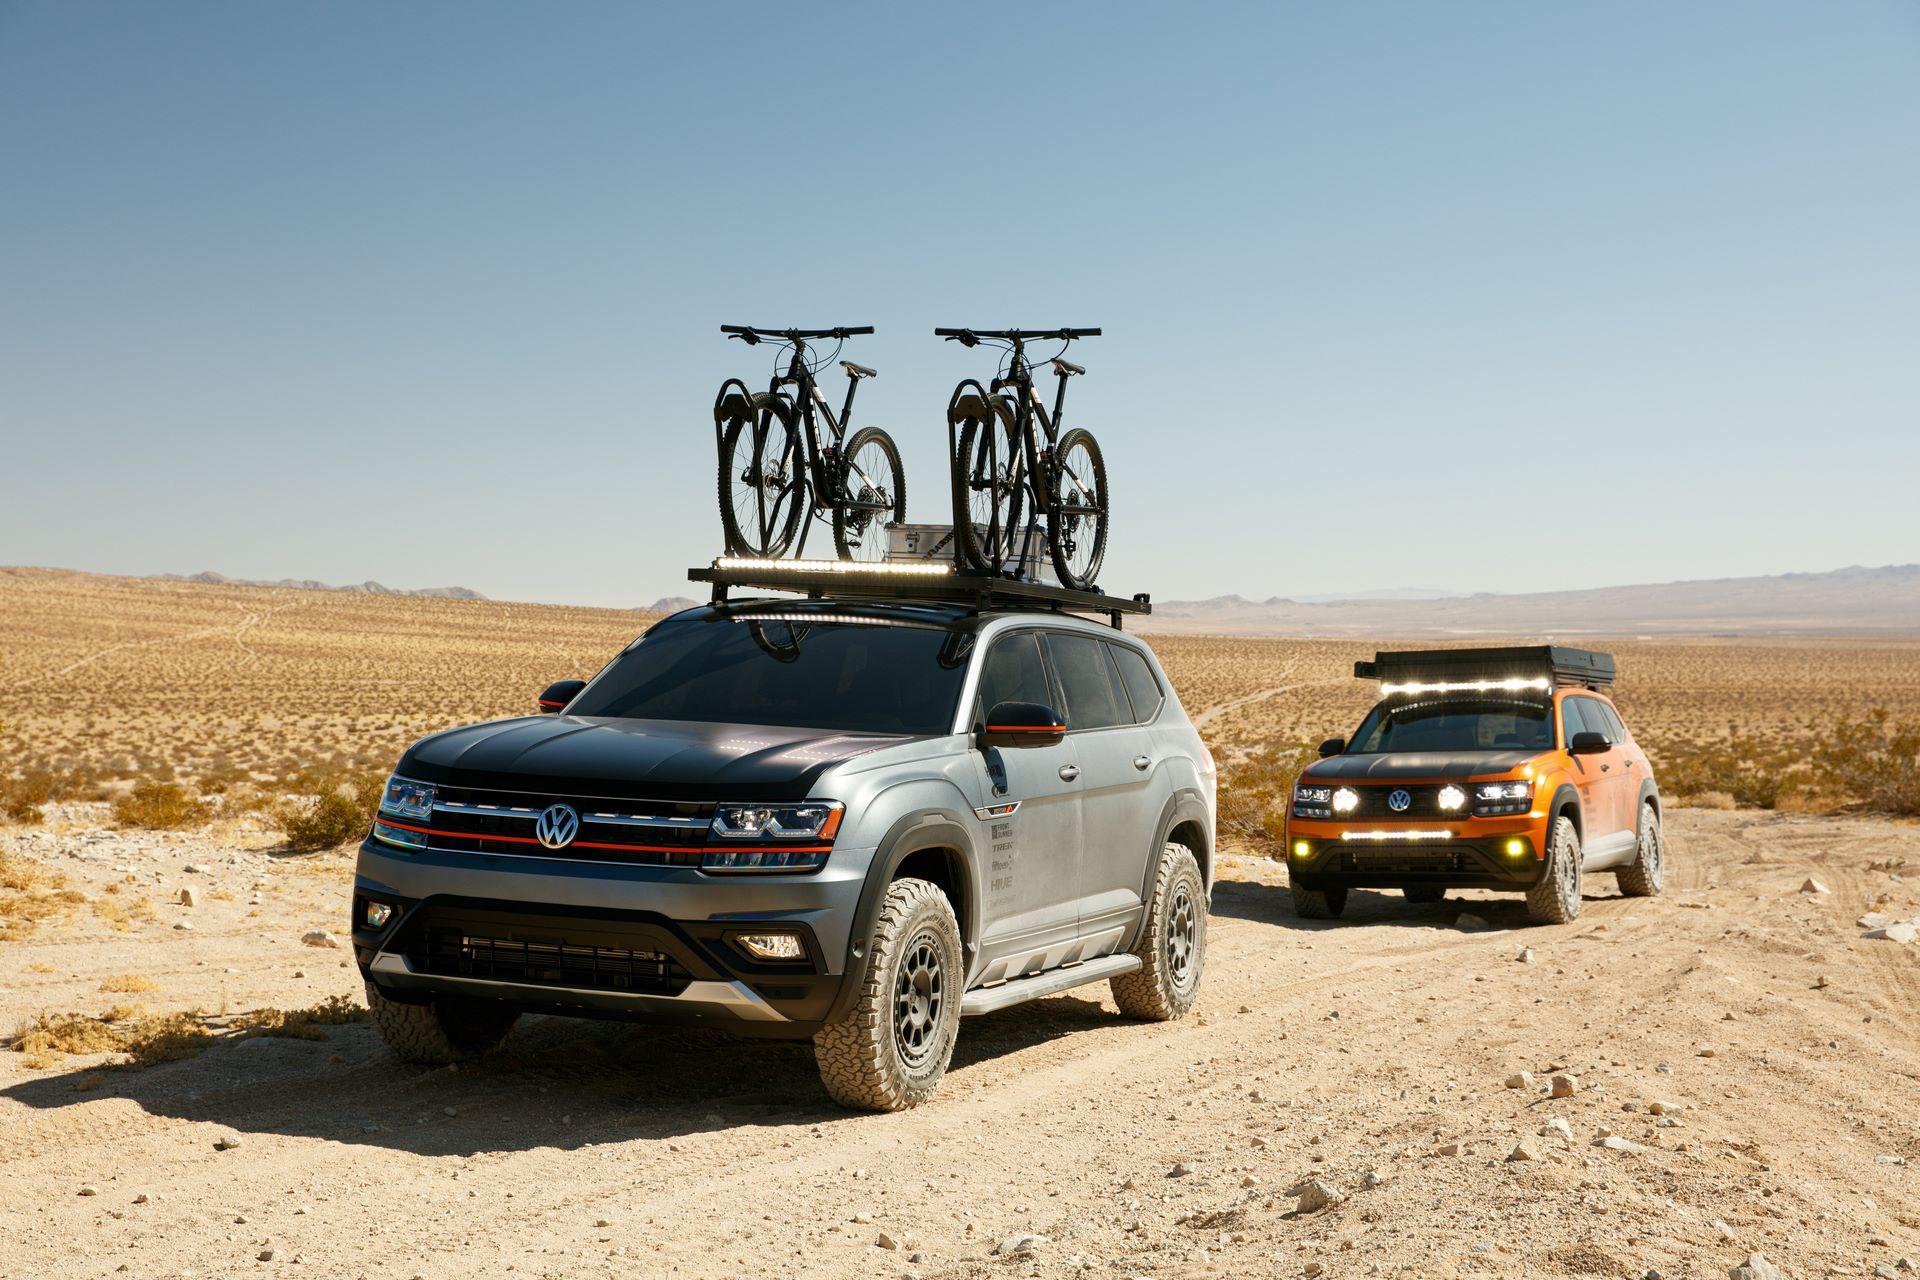 Volkswagen_Atlas_Adventure_Concept_and_Atlas_Basecamp_Concept-10440